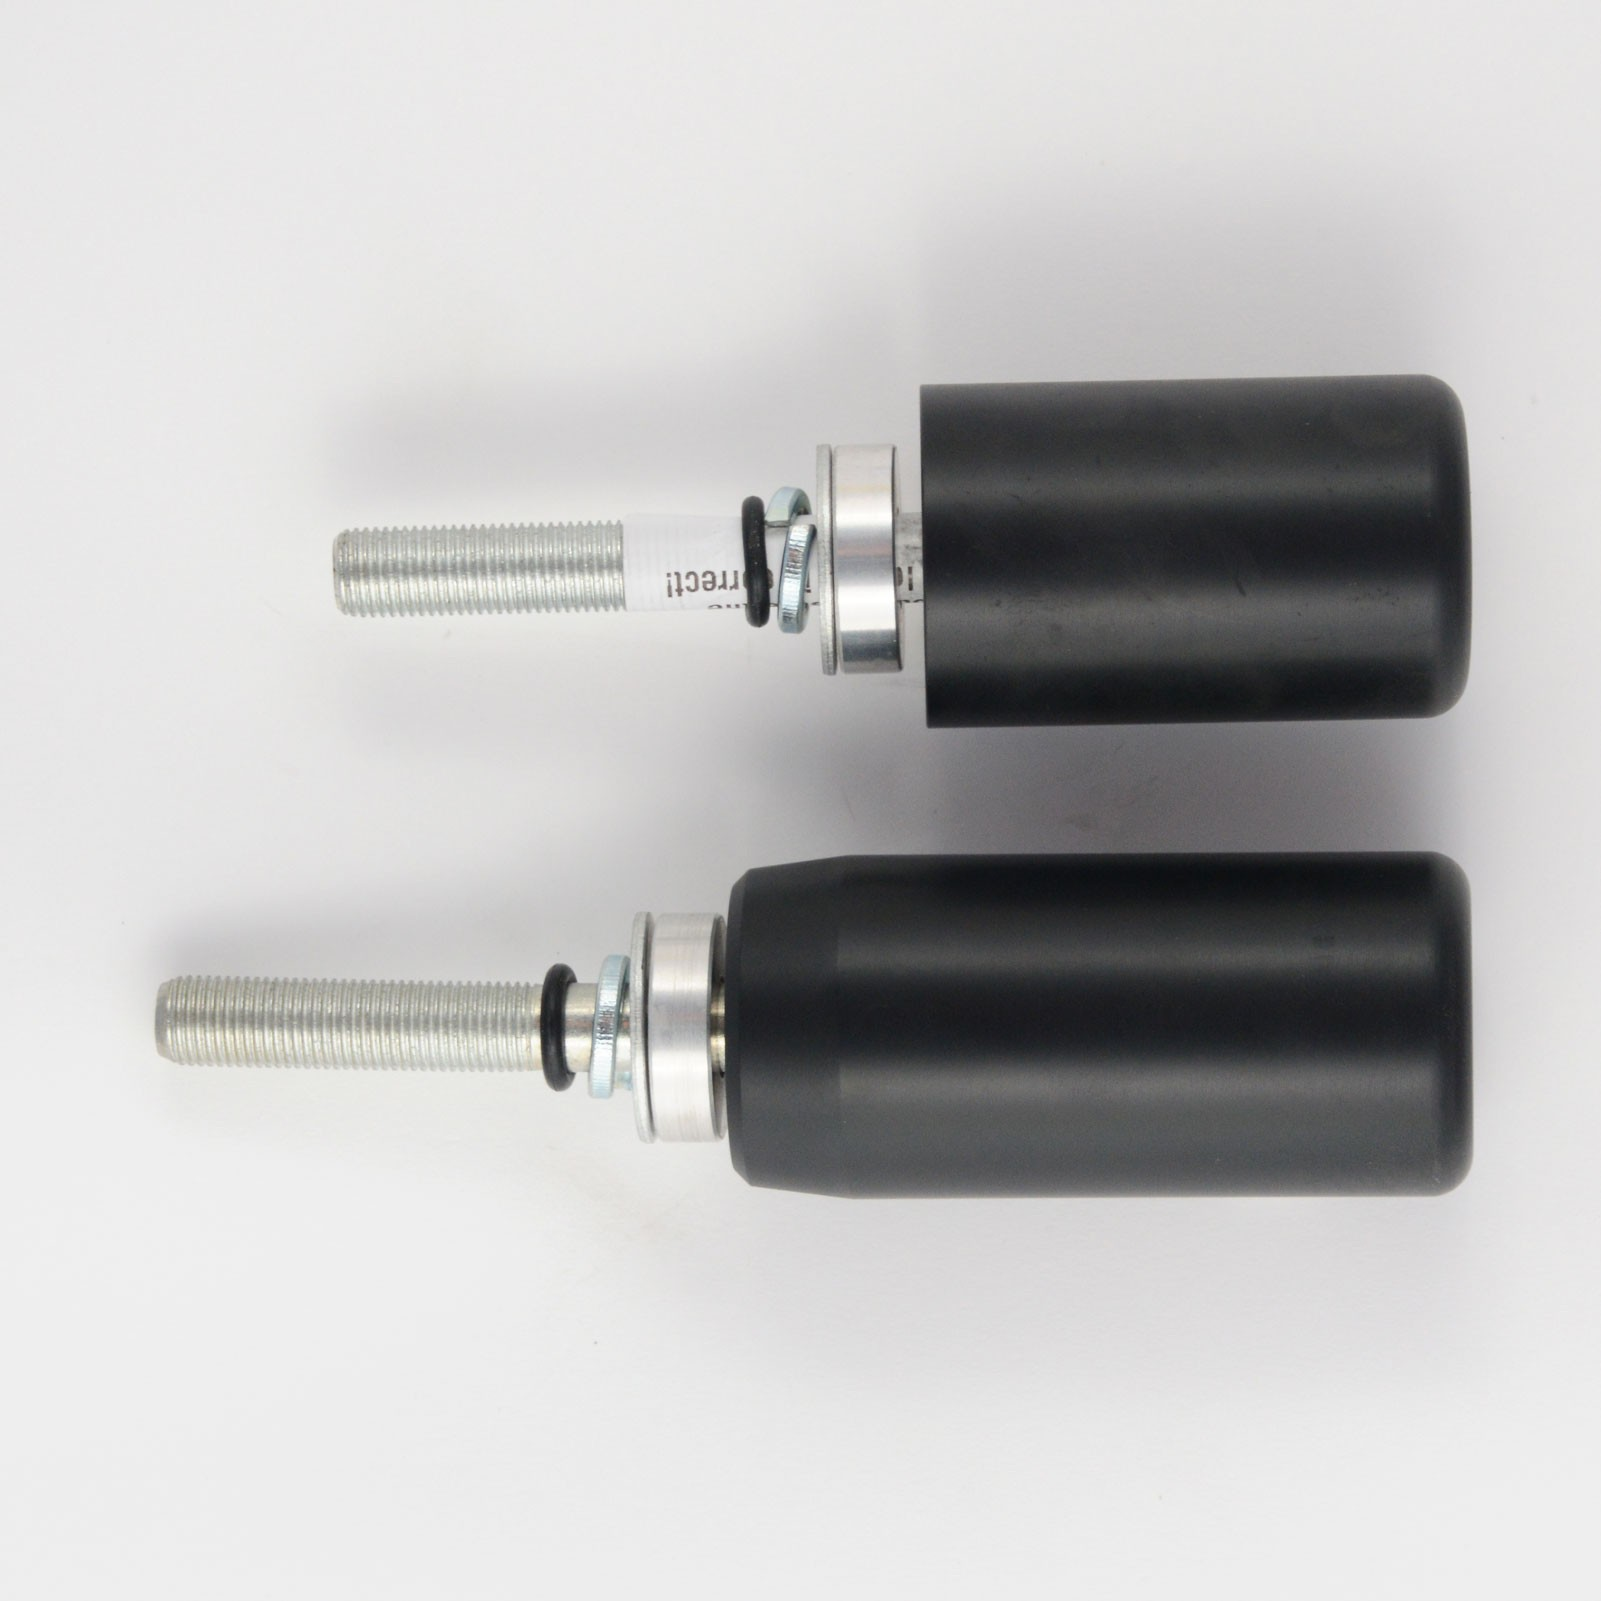 PM-1030-black-a-pro-tamponi-paracarena-protector-frame-slider-sonicmotoshop